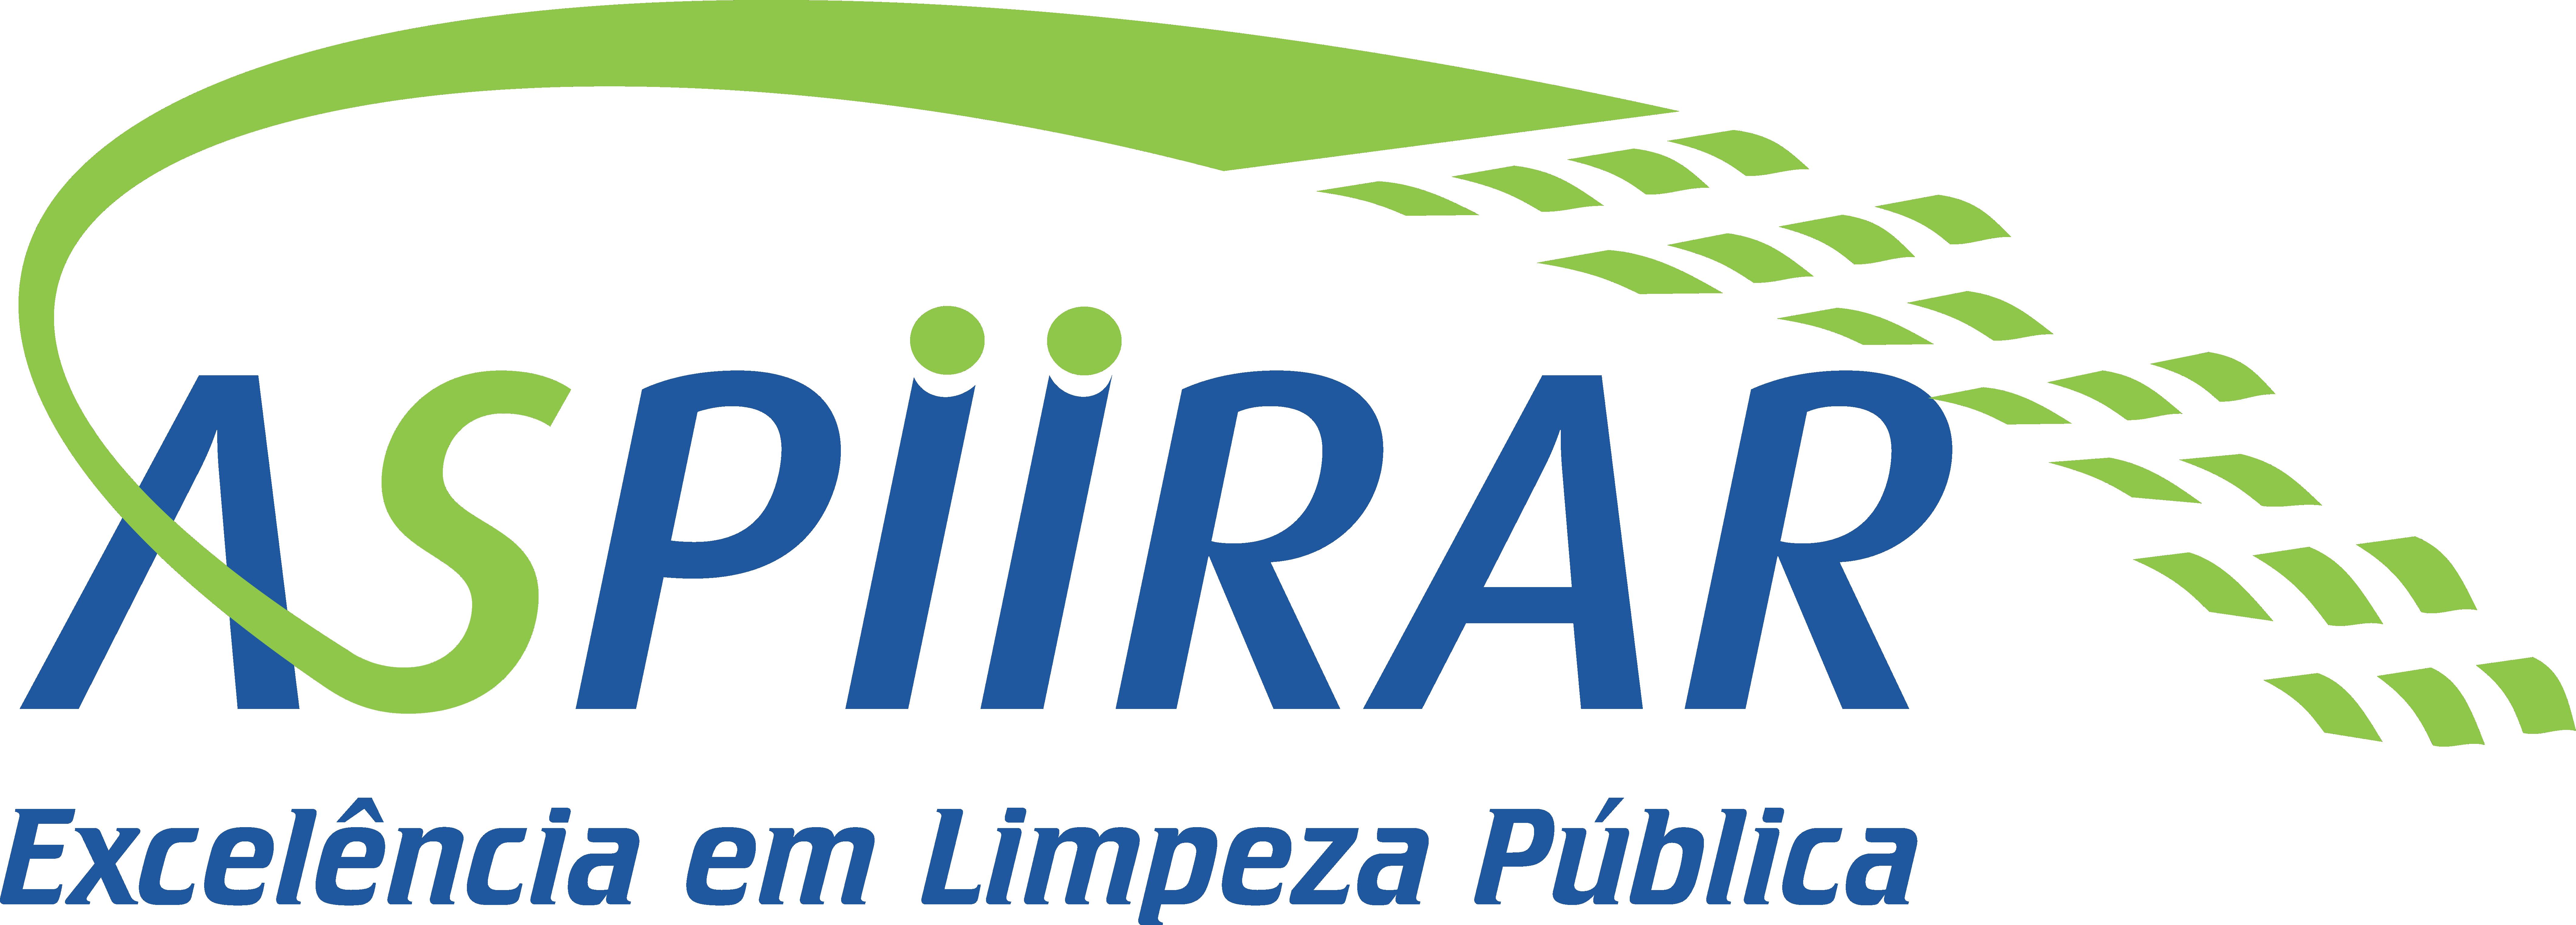 Logo_aspiirar